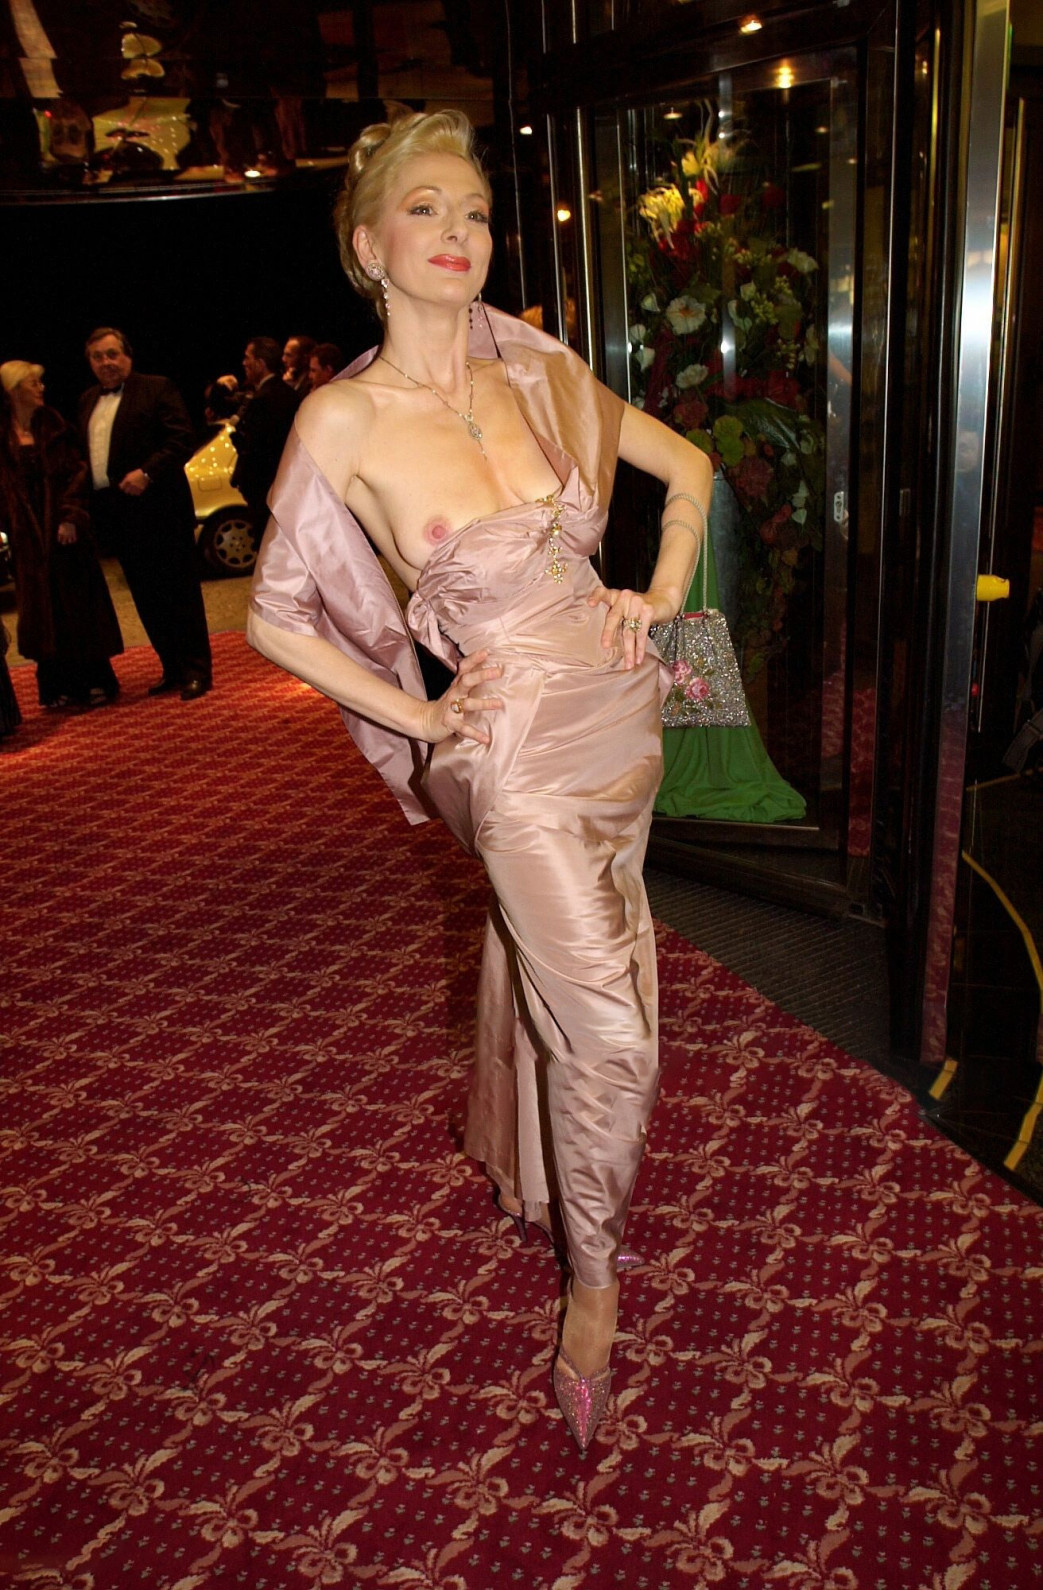 Desiree-Nick-Boob-Slip-at-unesco-benefiz-gala-2001-3.jpg